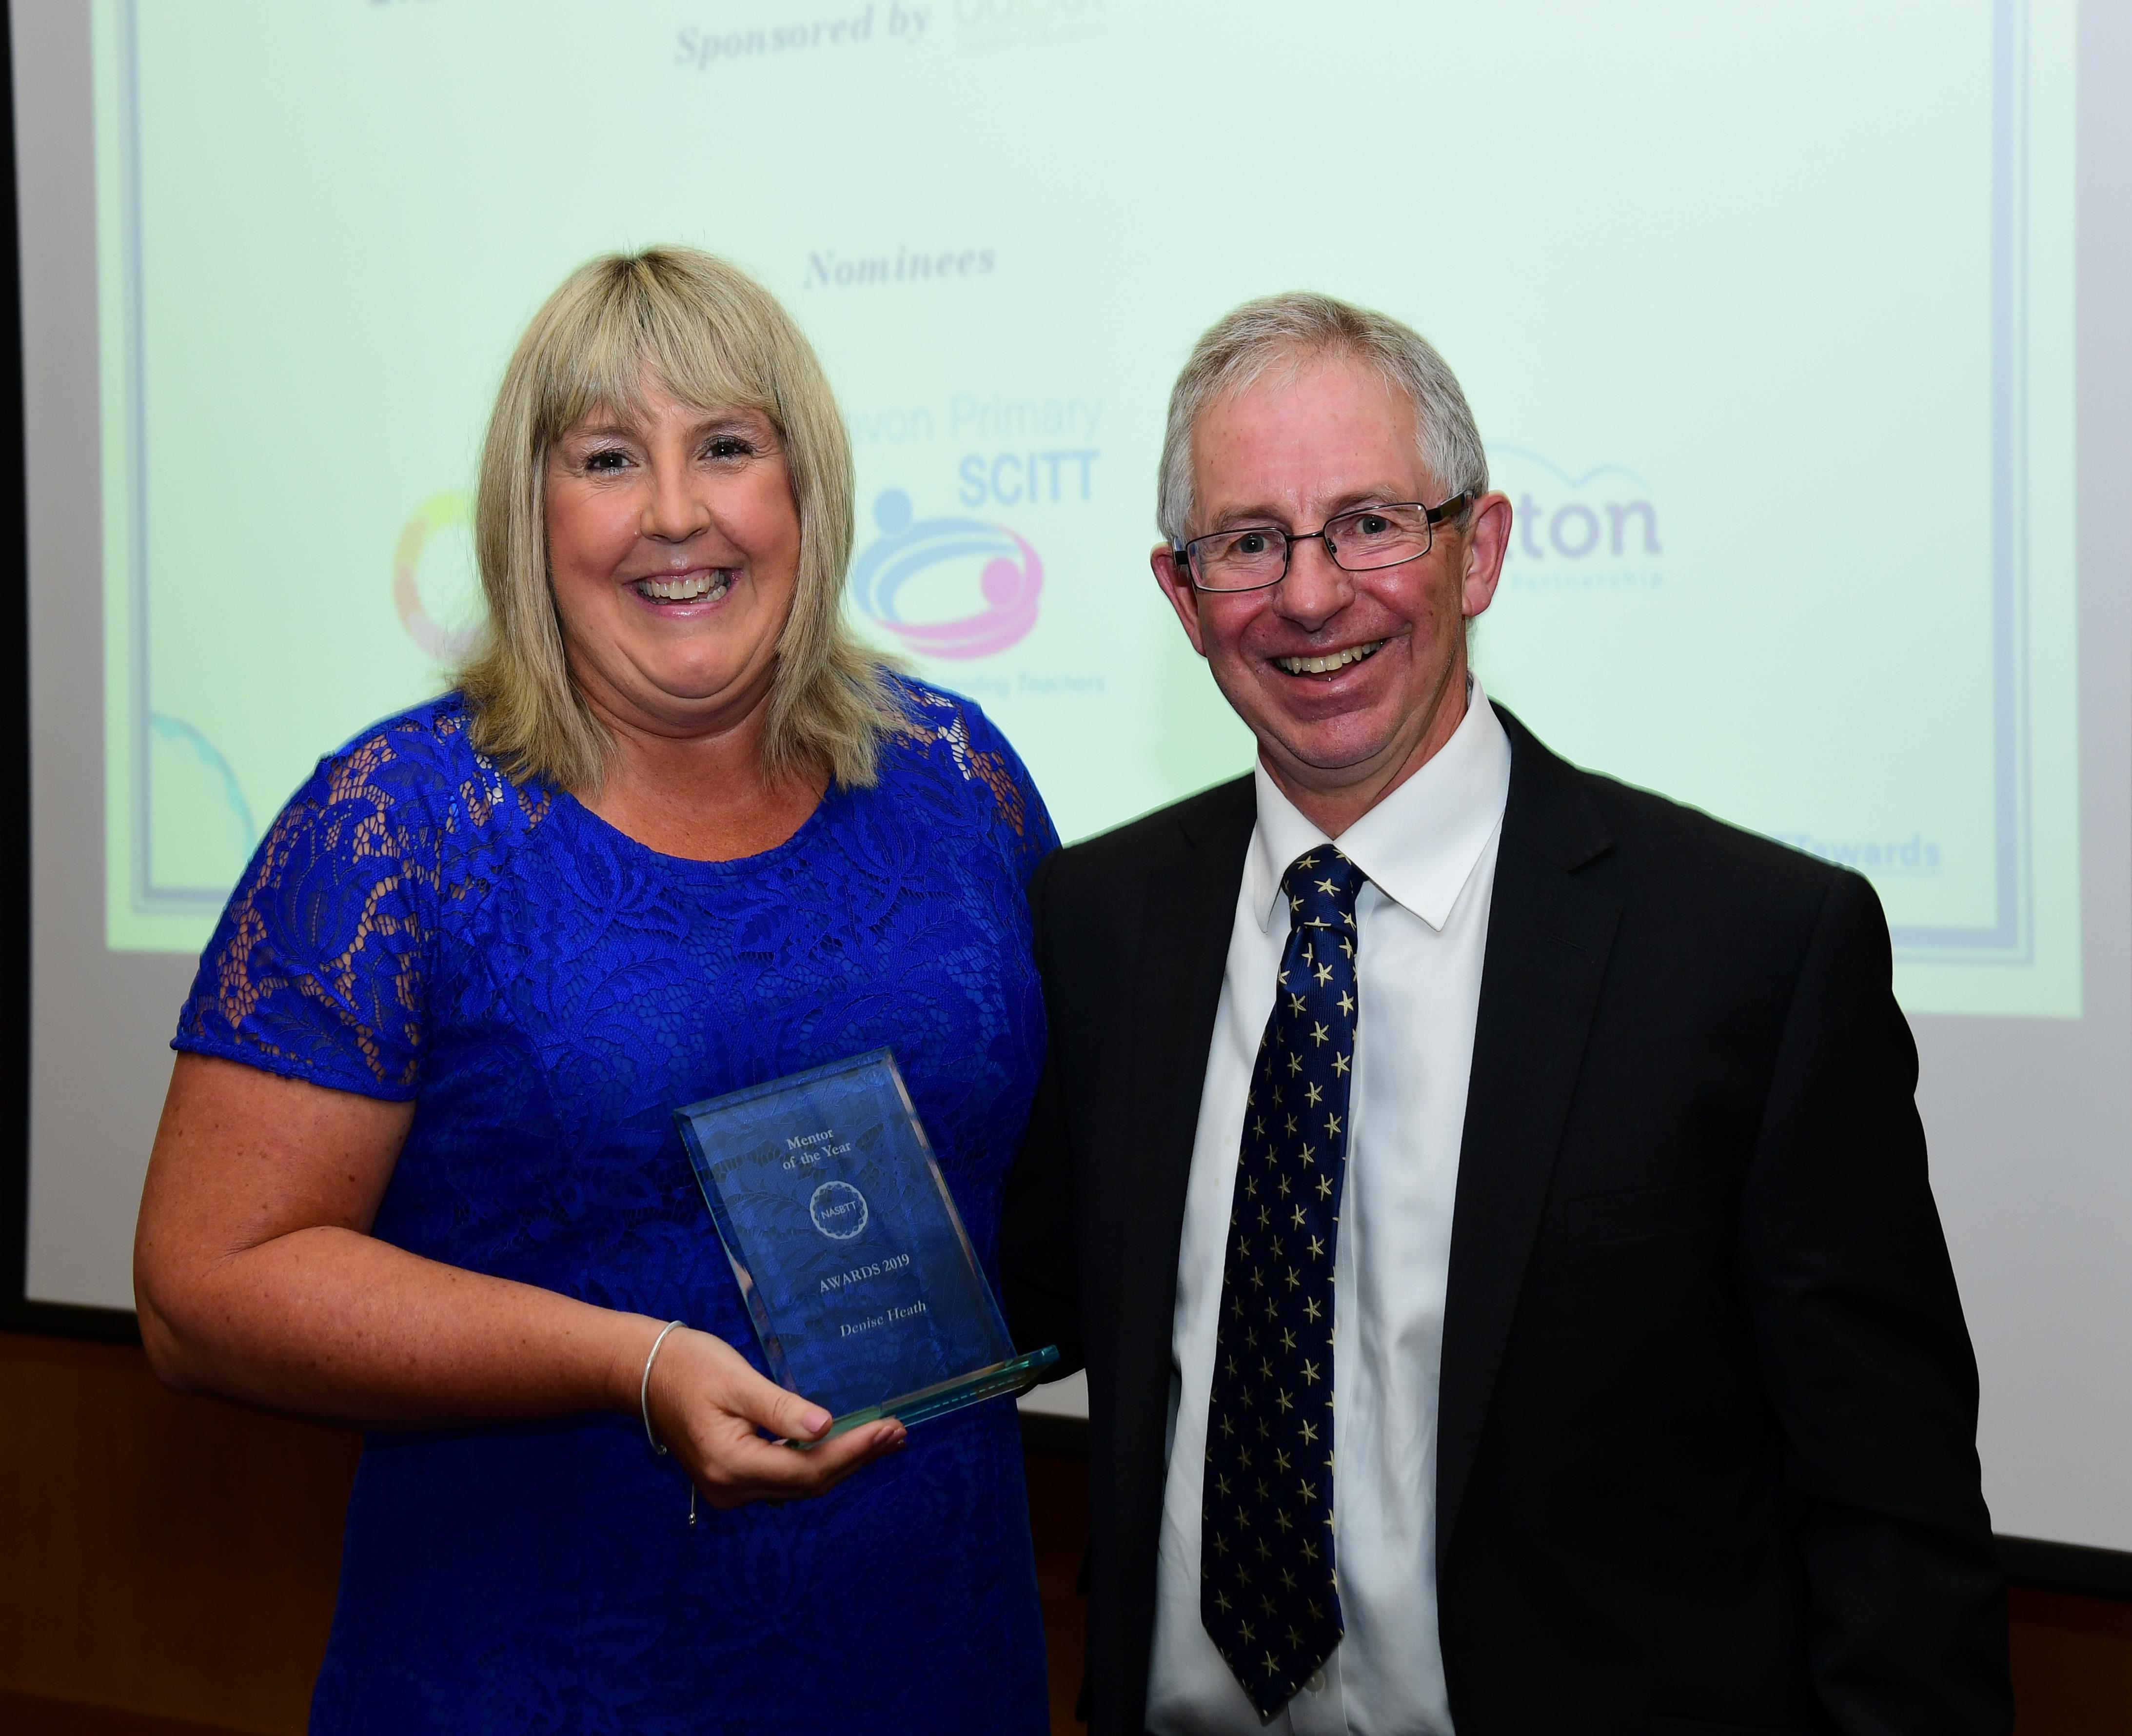 , NASBTT Awards 2019: North West SCITT's Denise Heath wins Mentor of the Year award, Skem News - The Top Source for Skelmersdale News